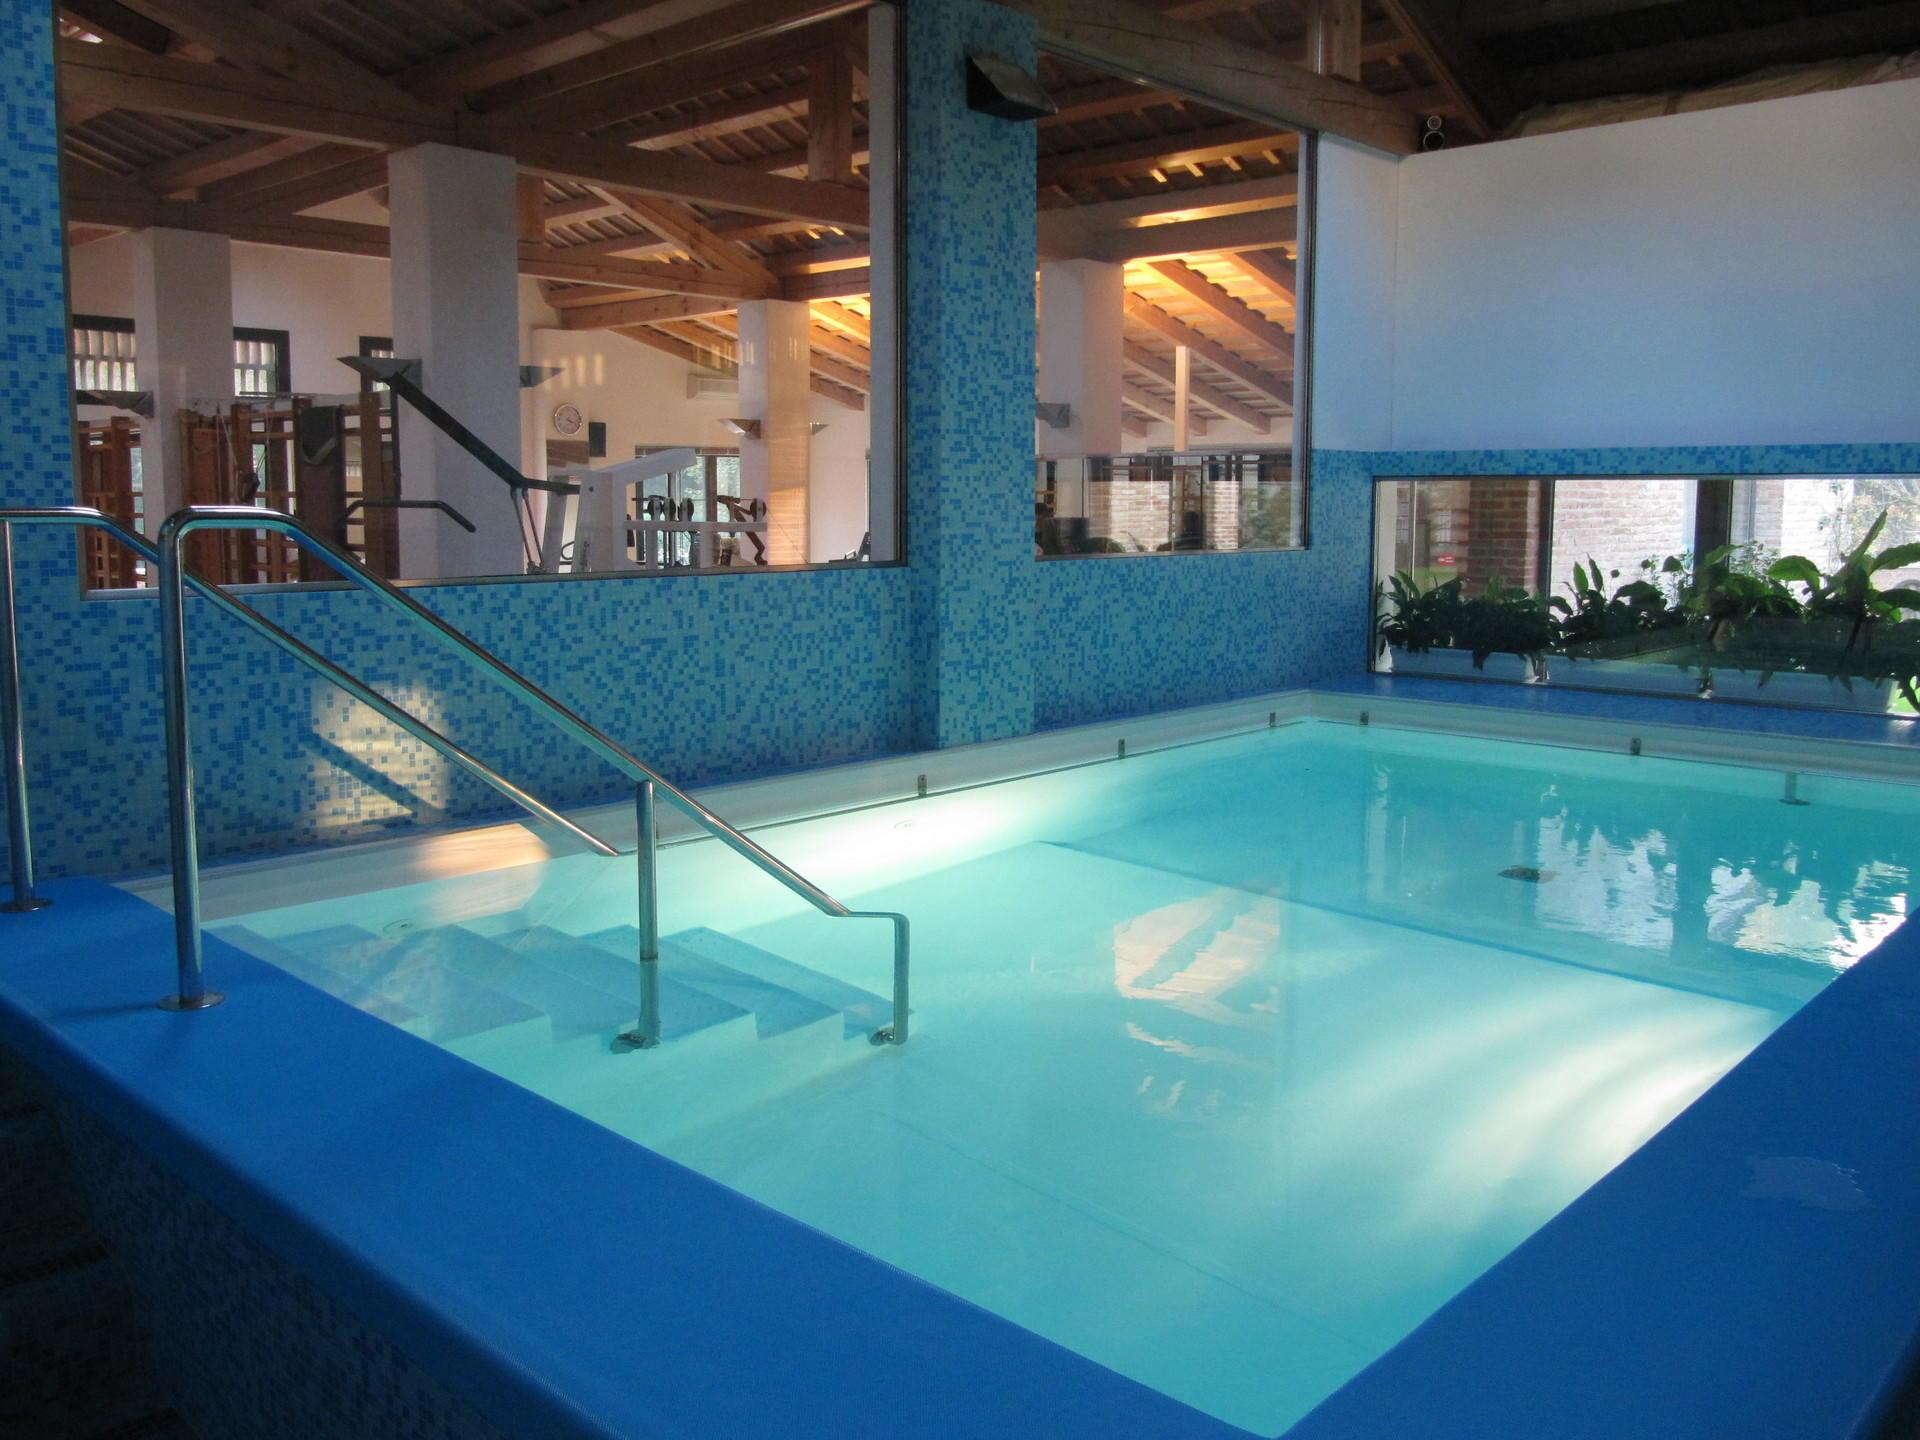 Centro San Marco foto piscina